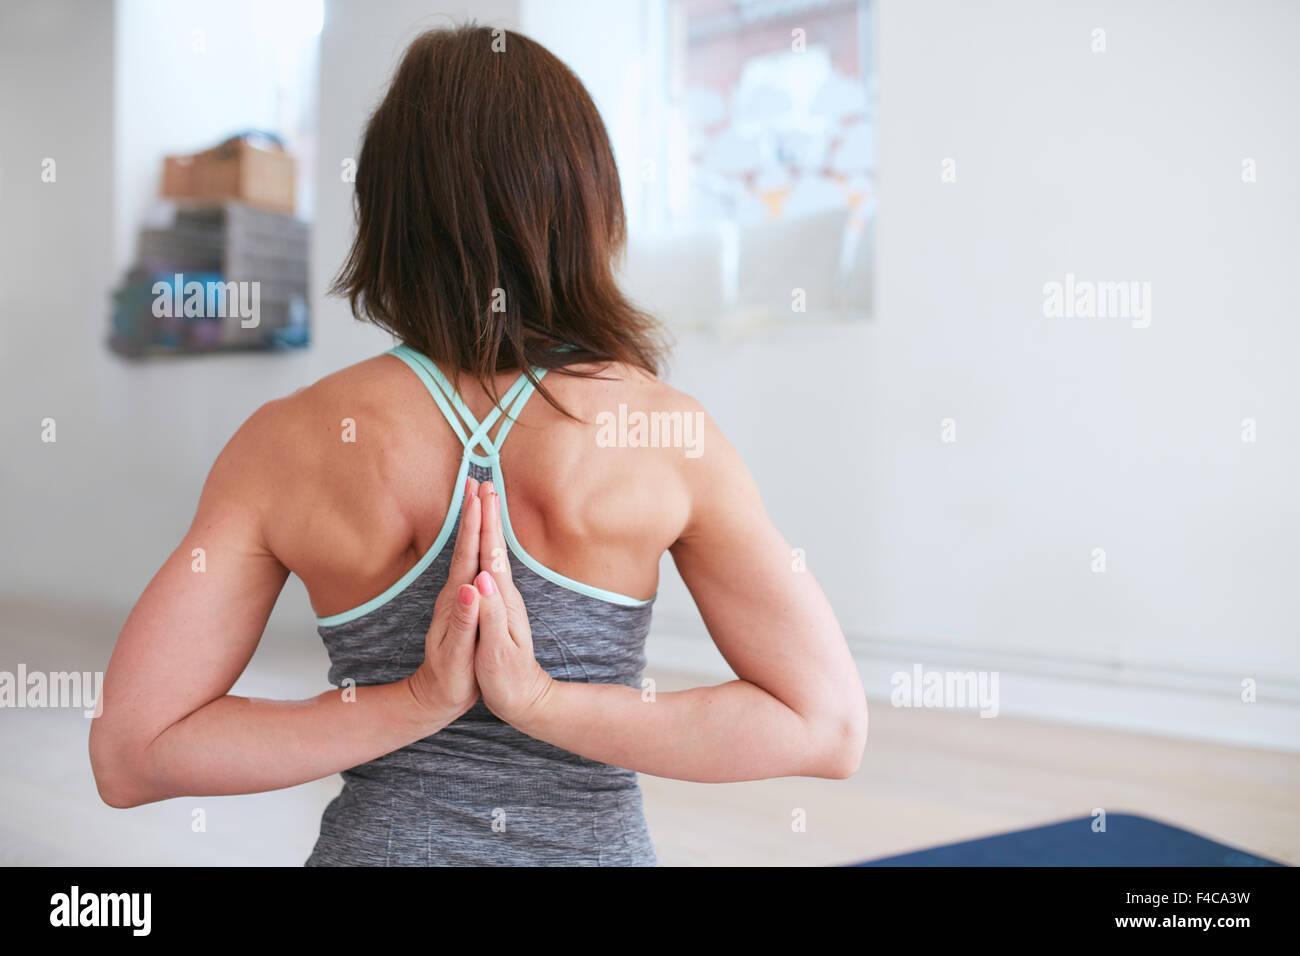 Heckansicht des Fitness-Frau Yoga in umgekehrter Gebet-Pose zu tun. Pashchima Namaskarasana von einer Frau im Fitnessstudio Stockbild